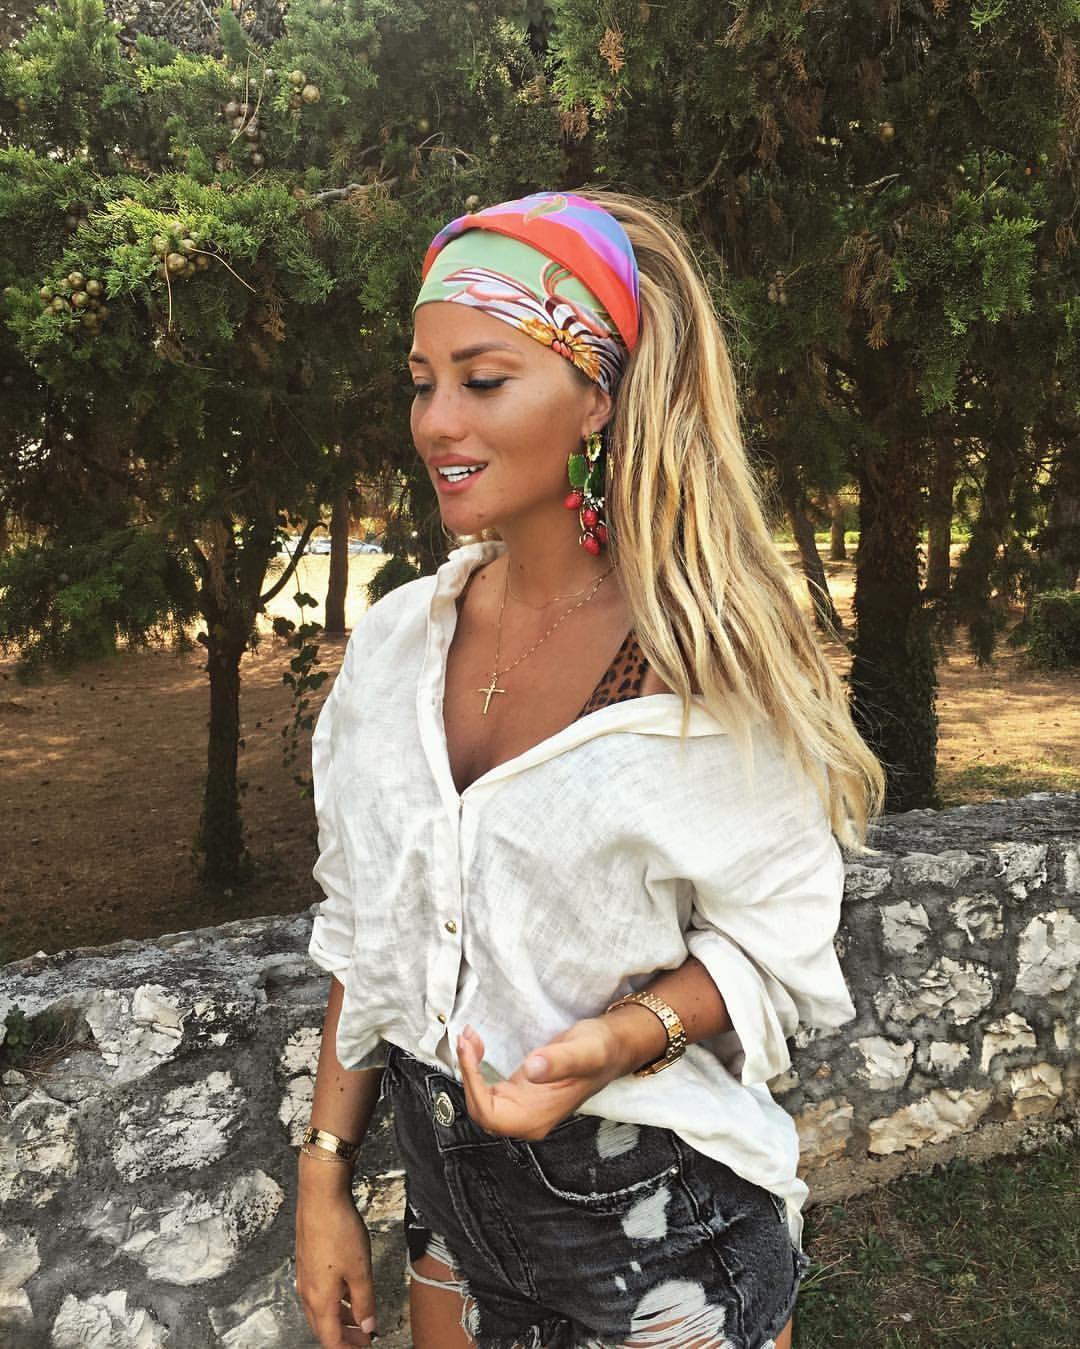 Pin by Torbicaaaa on ig beauties. | Fashion, Hair styles ...